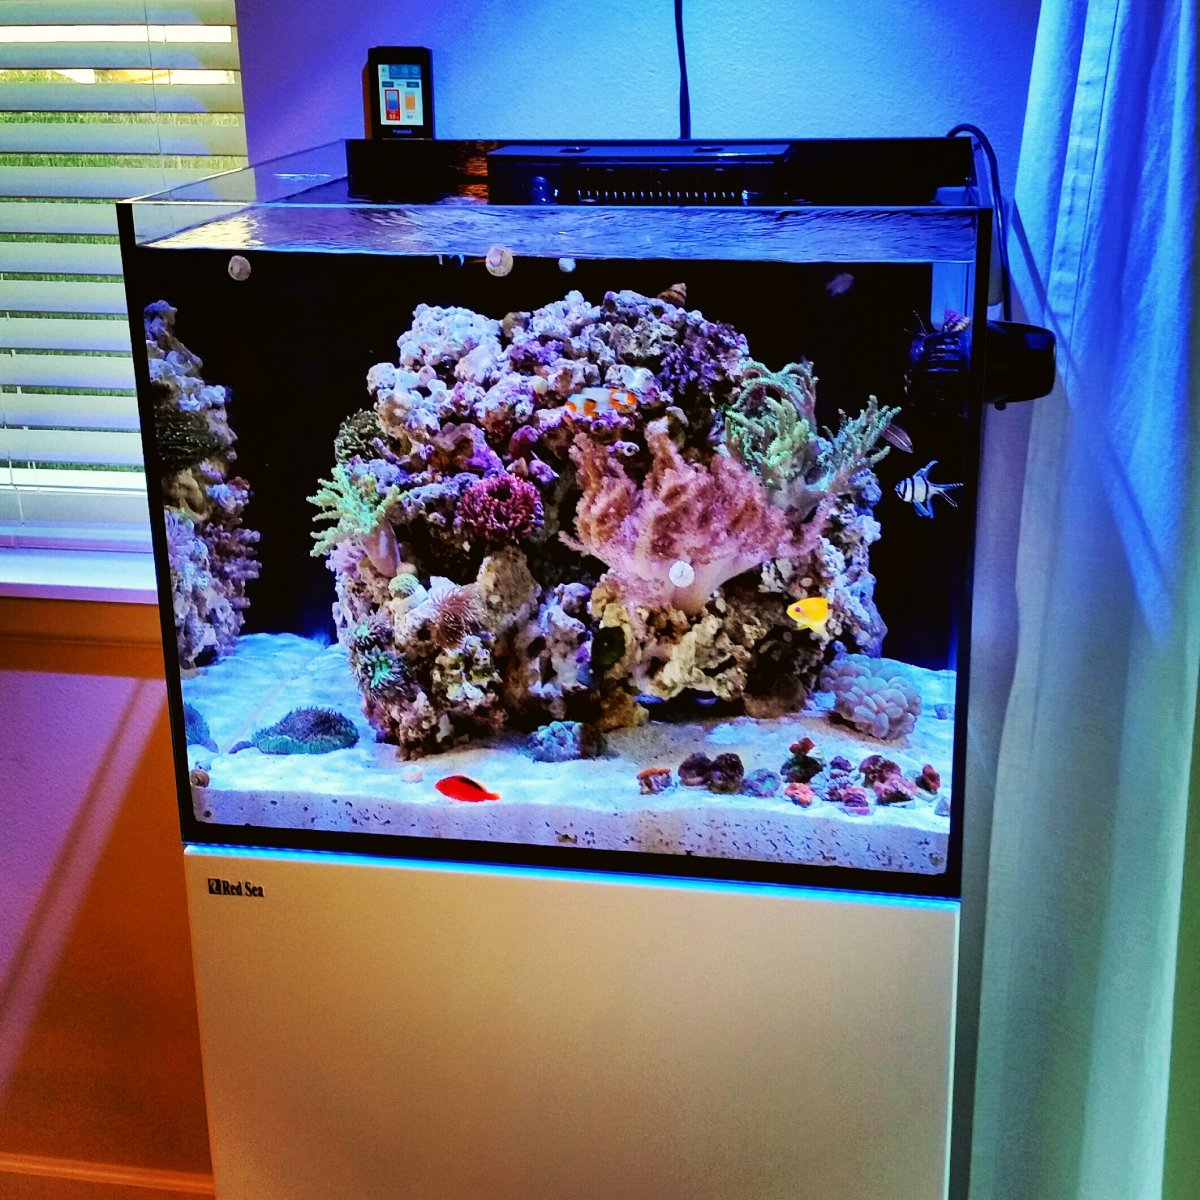 dd911 39 s red sea reefer 170 reef2reef saltwater and reef. Black Bedroom Furniture Sets. Home Design Ideas